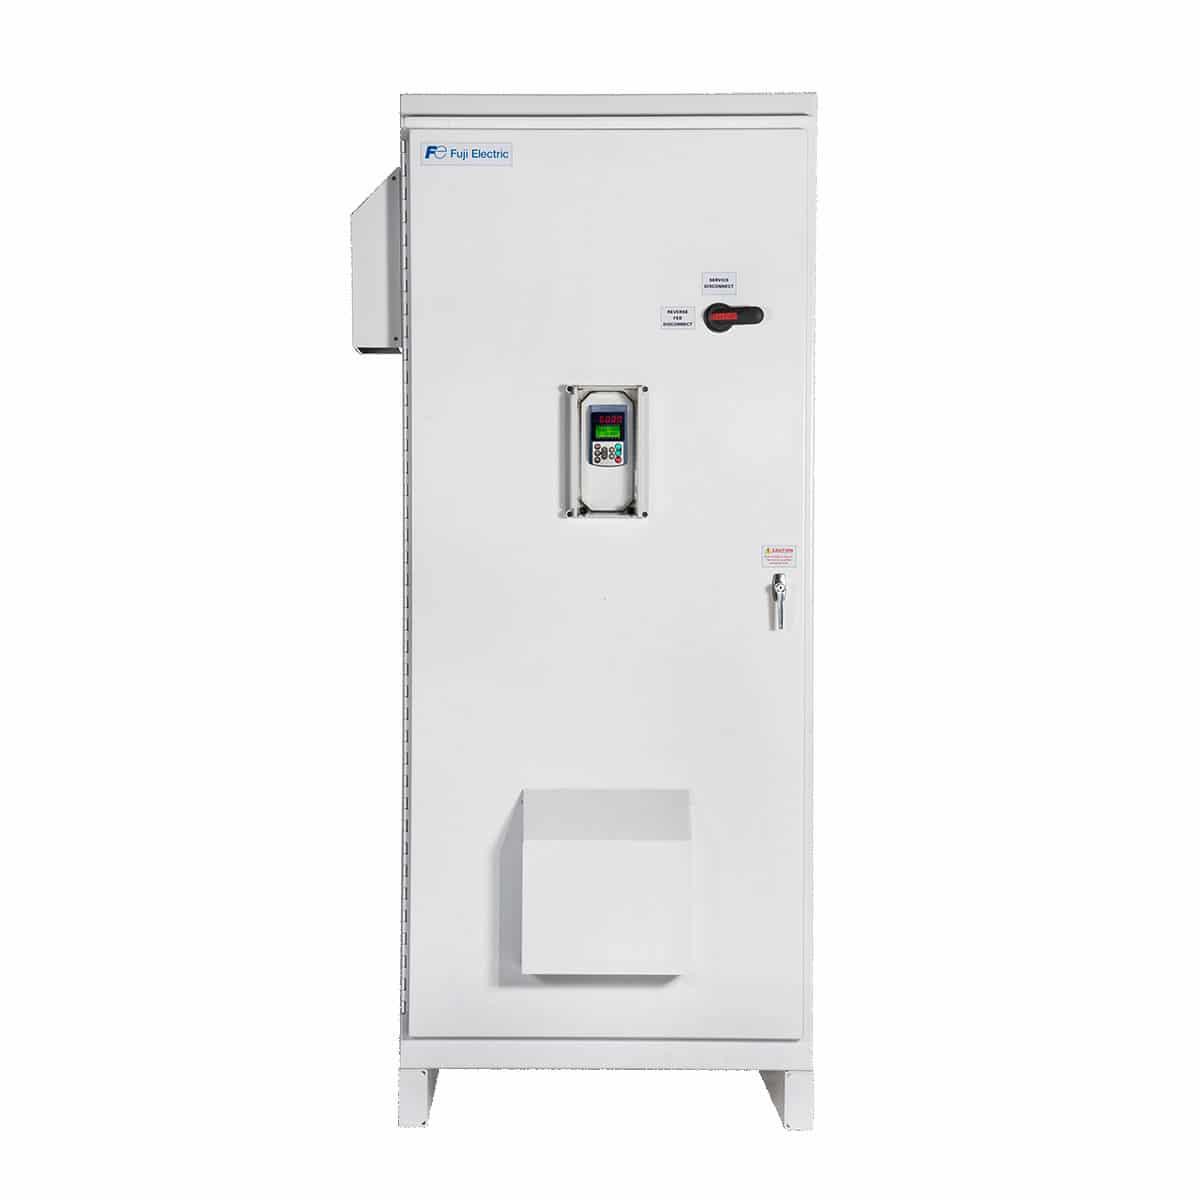 VFD Drives - Industrial Power Inverter AC Drives | Fuji Electric